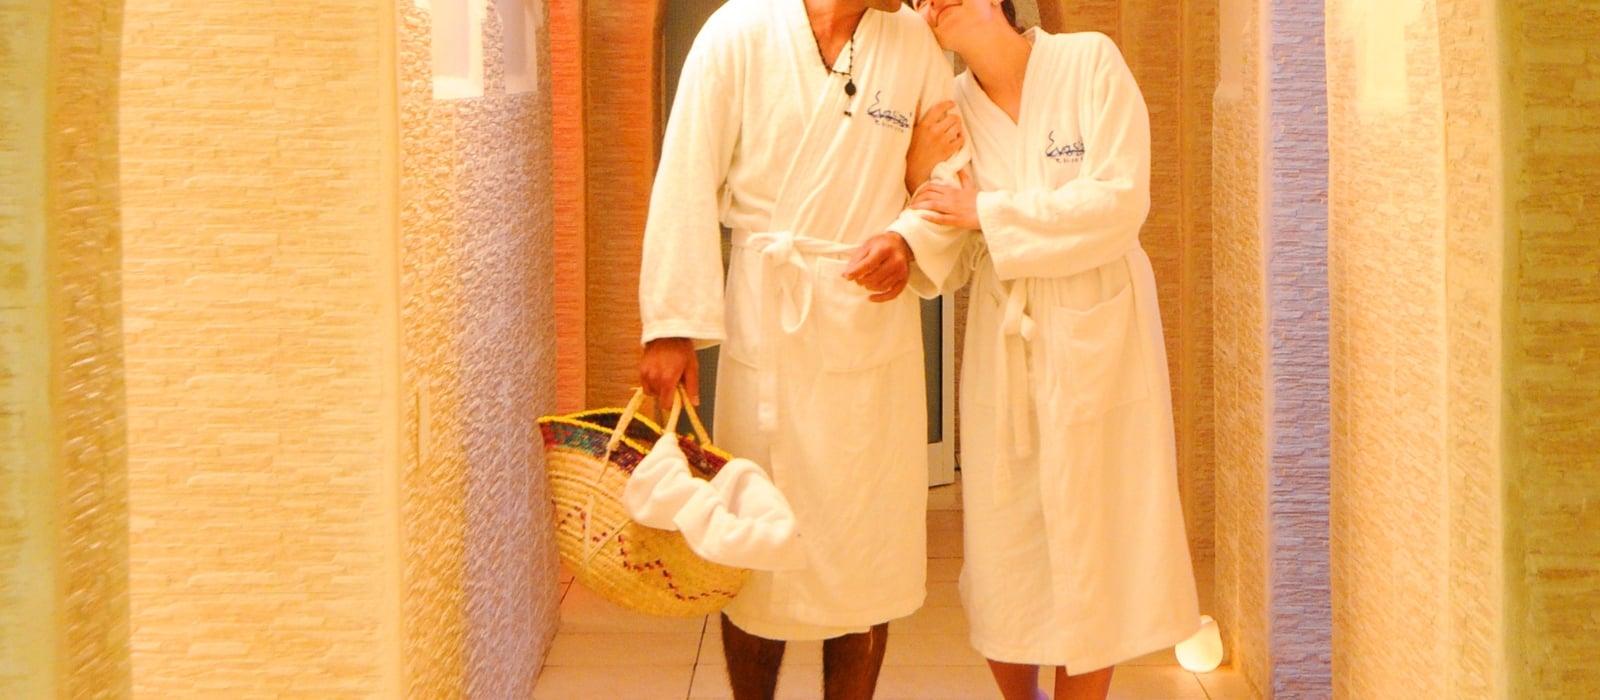 Dienstleistungen Hotel Djerba Resort - Vincci Hoteles - Spa